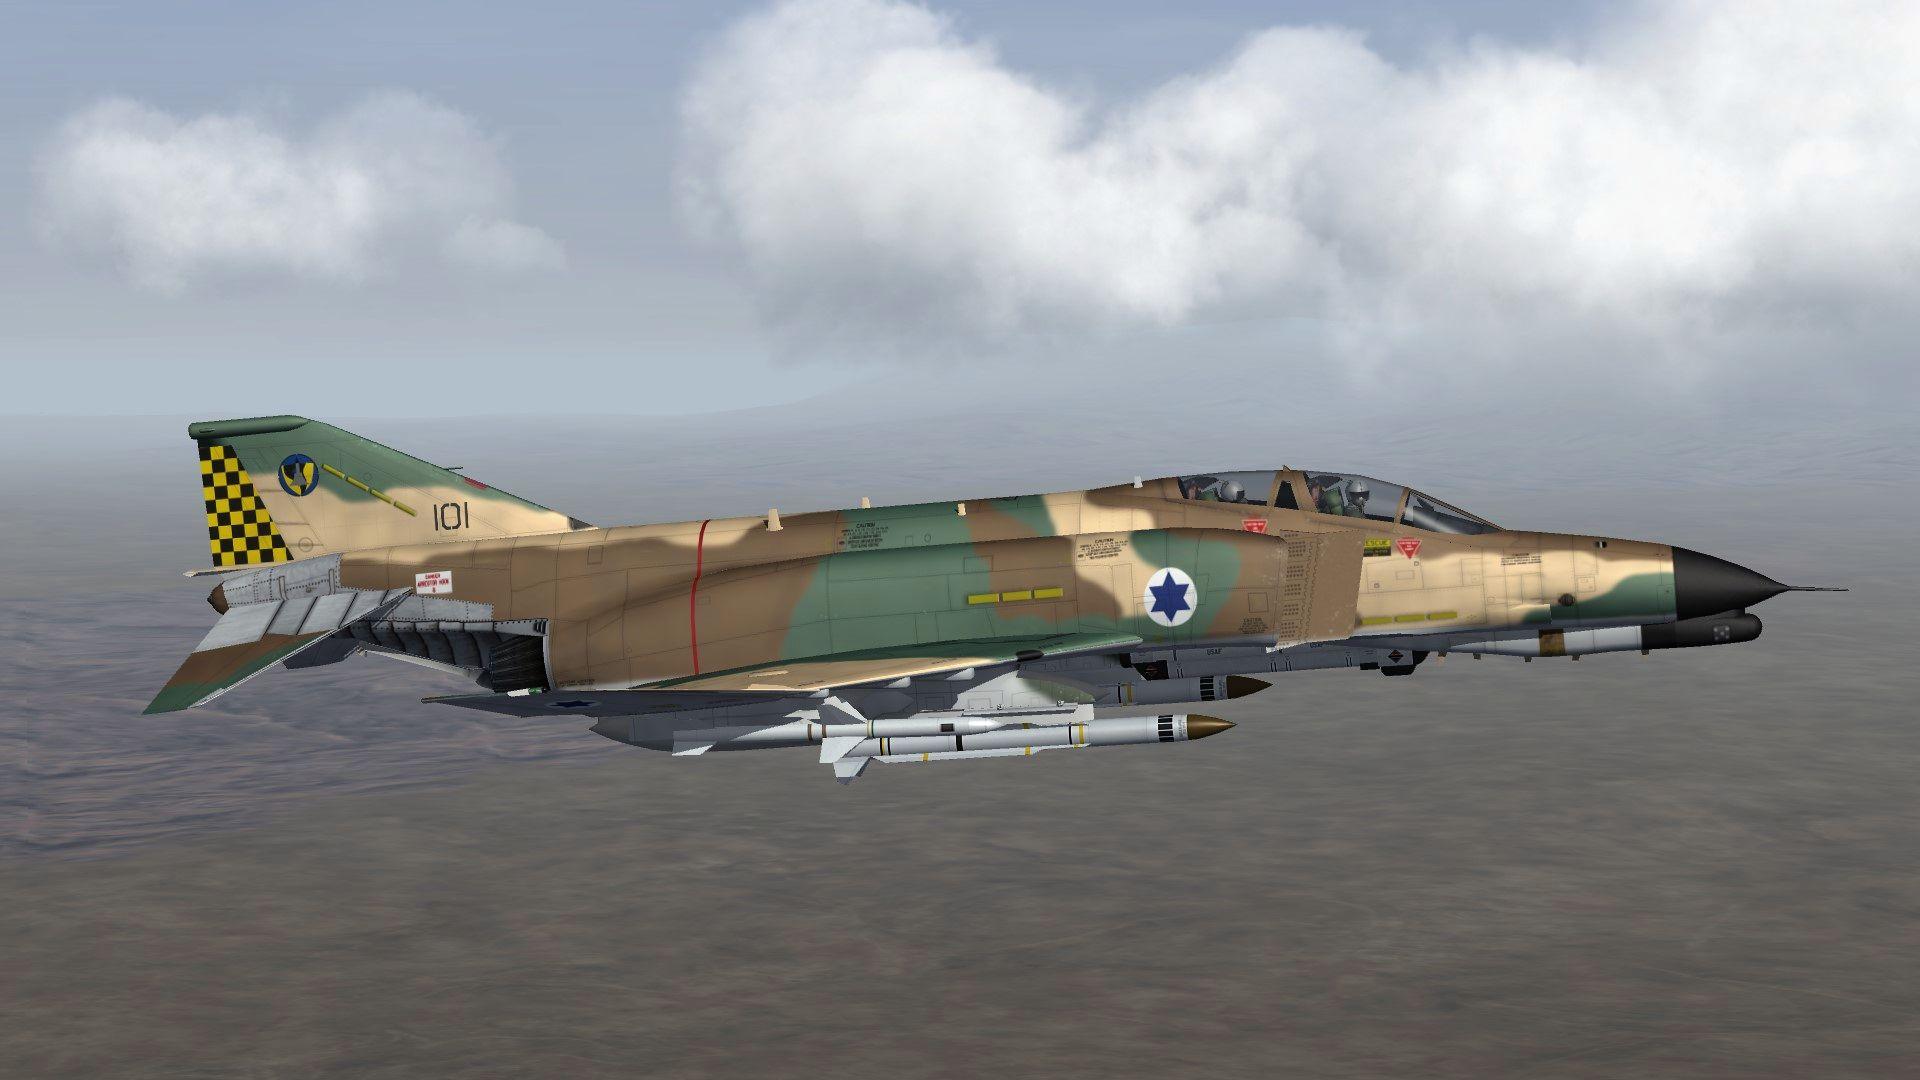 IDF%20F-4G%20PHANTOM.06_zpsz7f8us0x.jpg